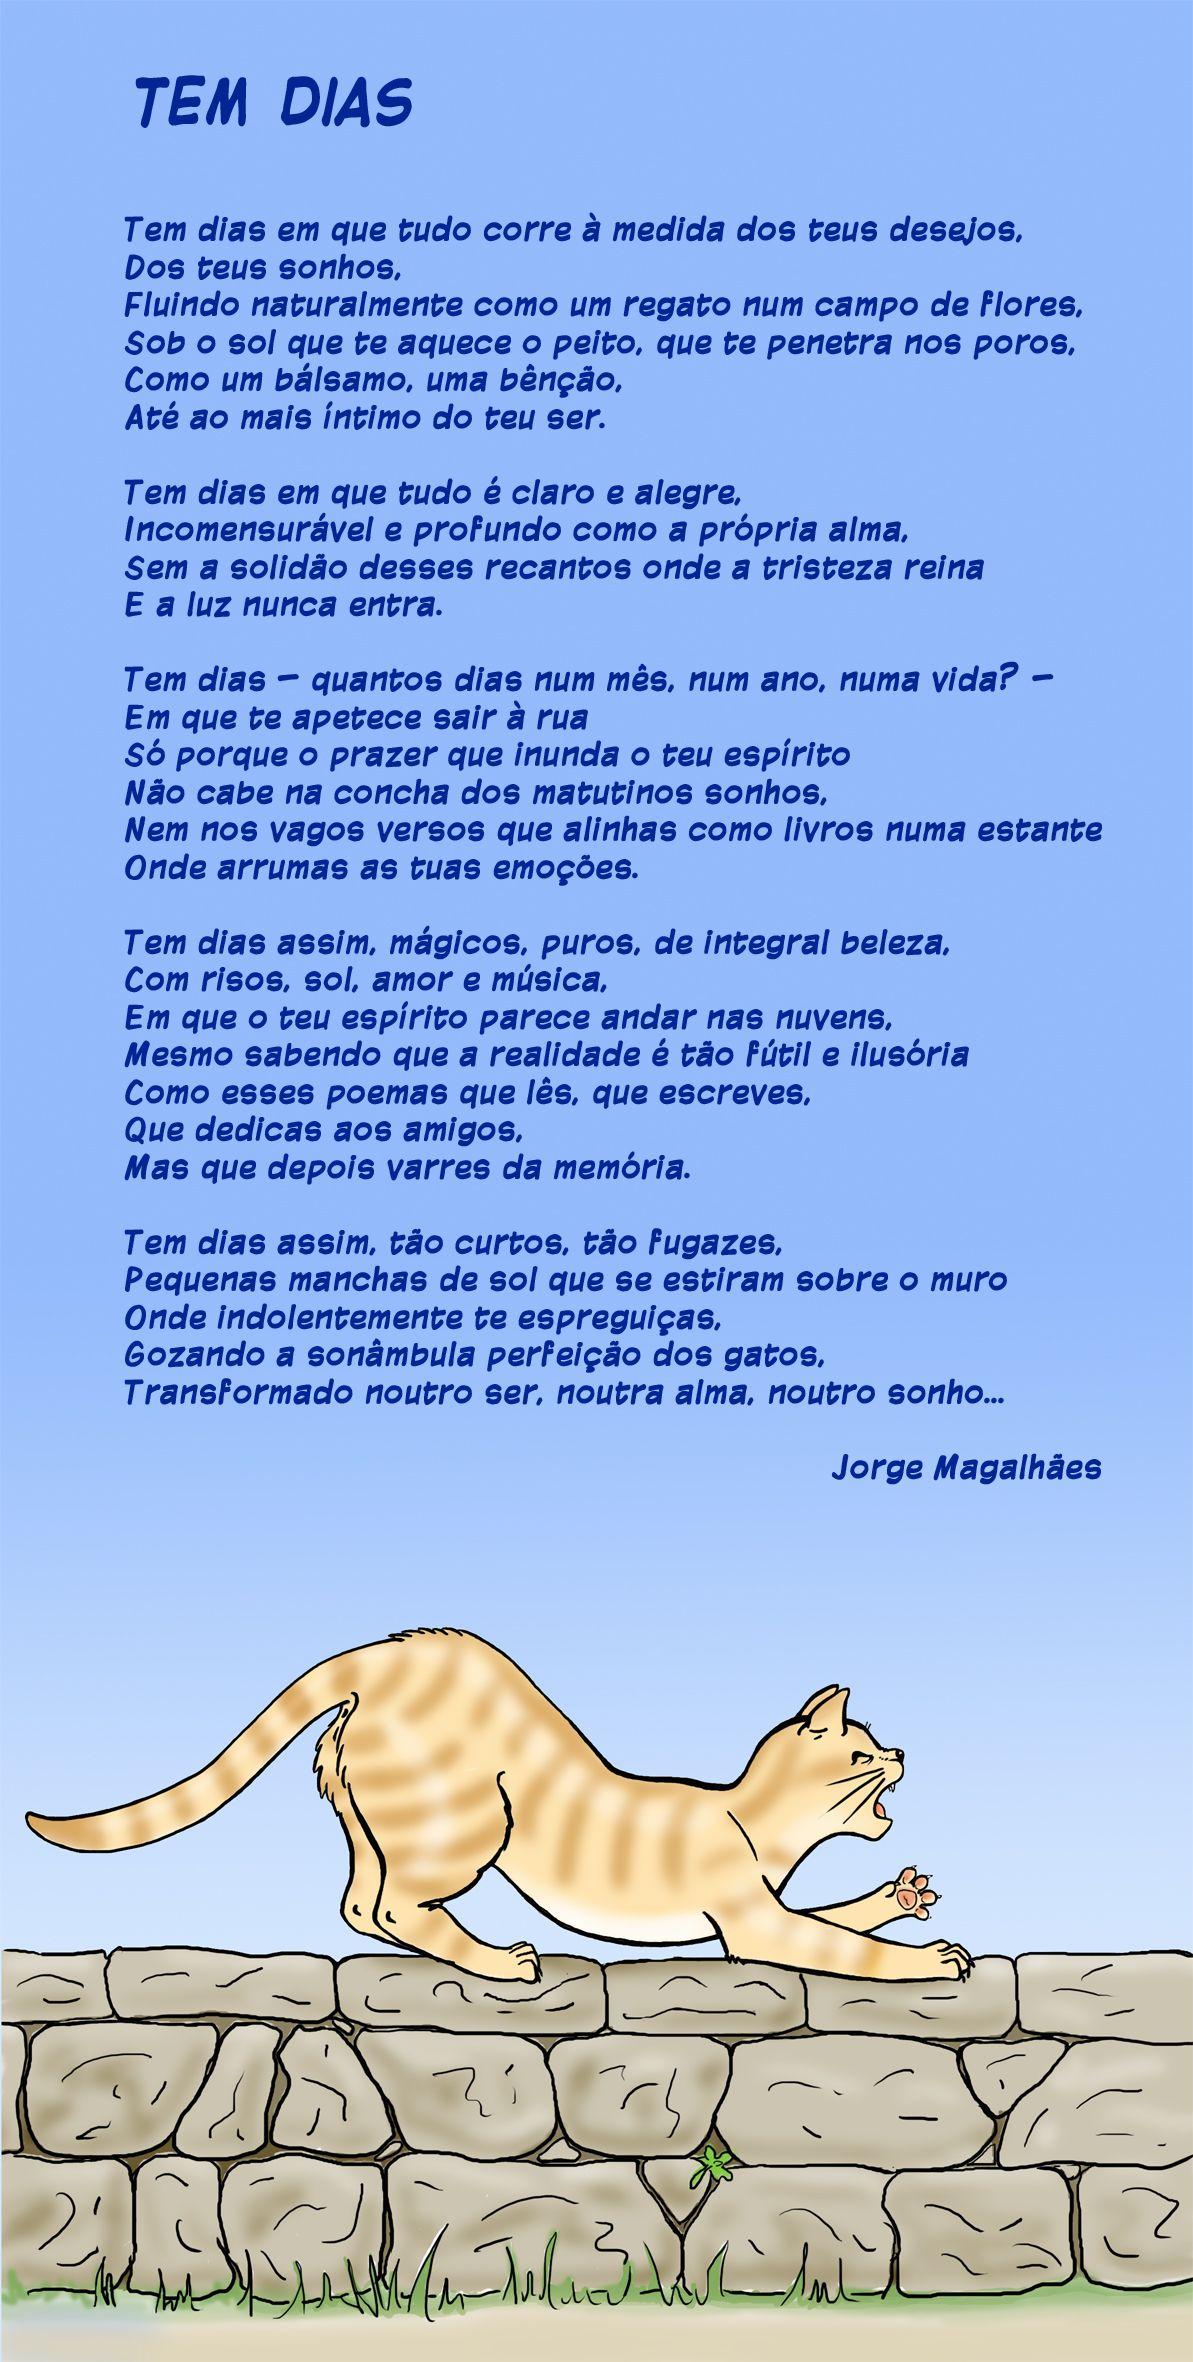 Poesia Felina Poema Poesia Frases Animais Felino